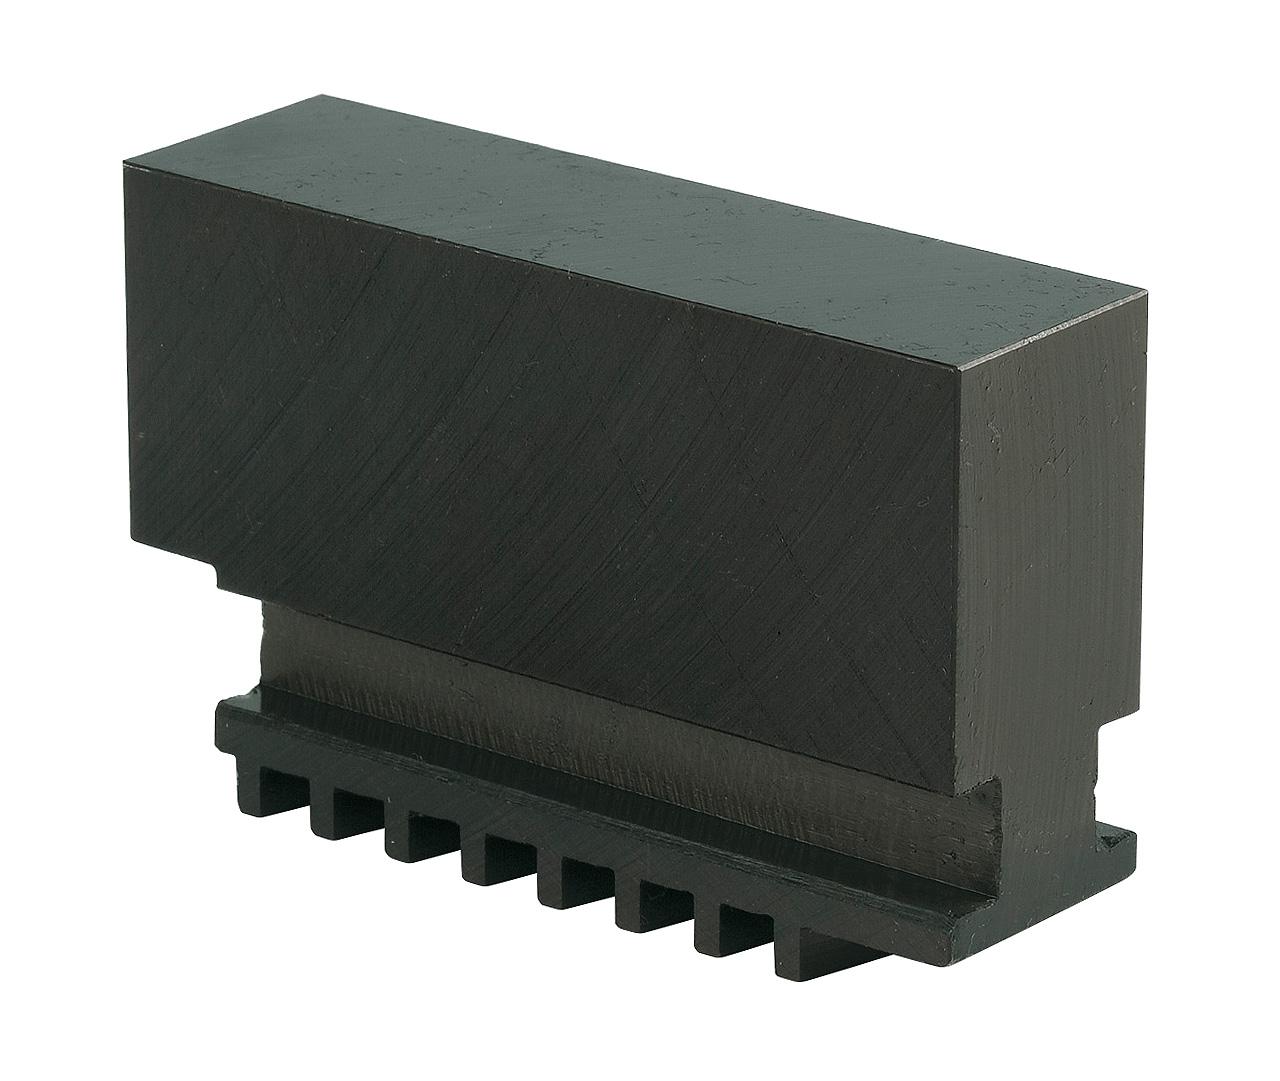 Szczęki jednolite miękkie - komplet DSJ-DK12-80 BERNARDO